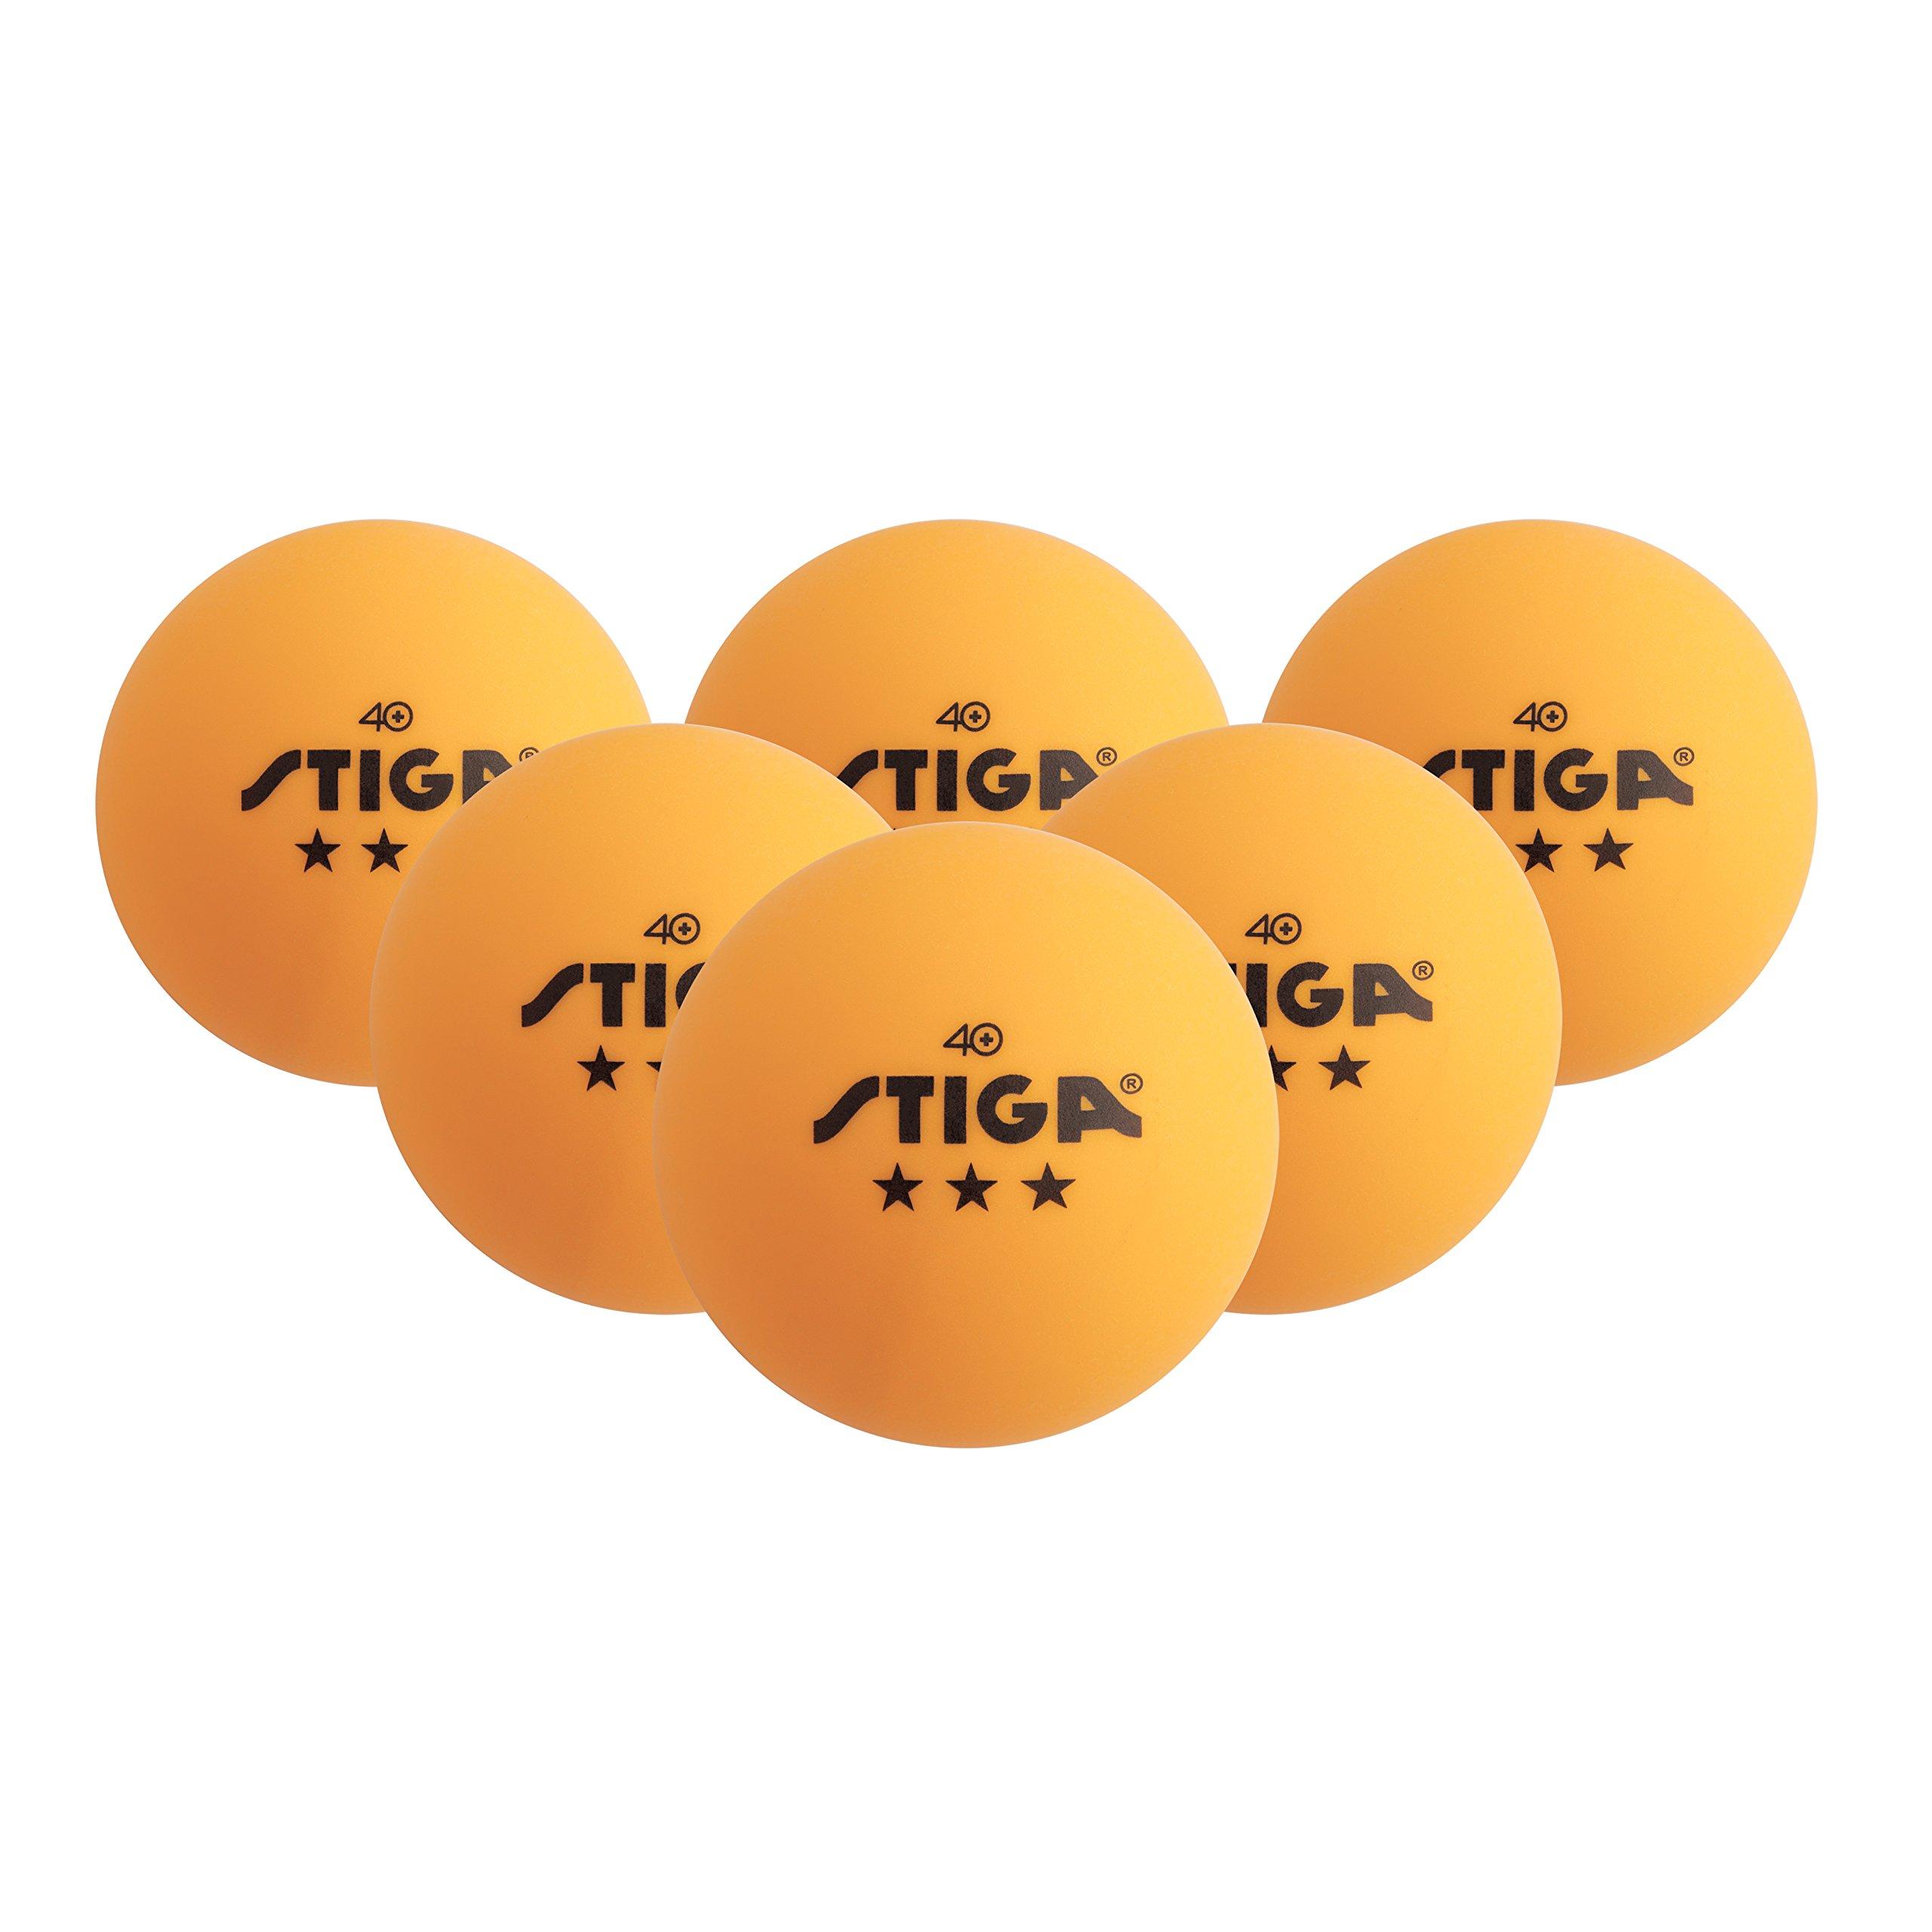 STIGA 3-Star Superior-Quality Orange Table Tennis Balls for Tournament Play (6-Pack)